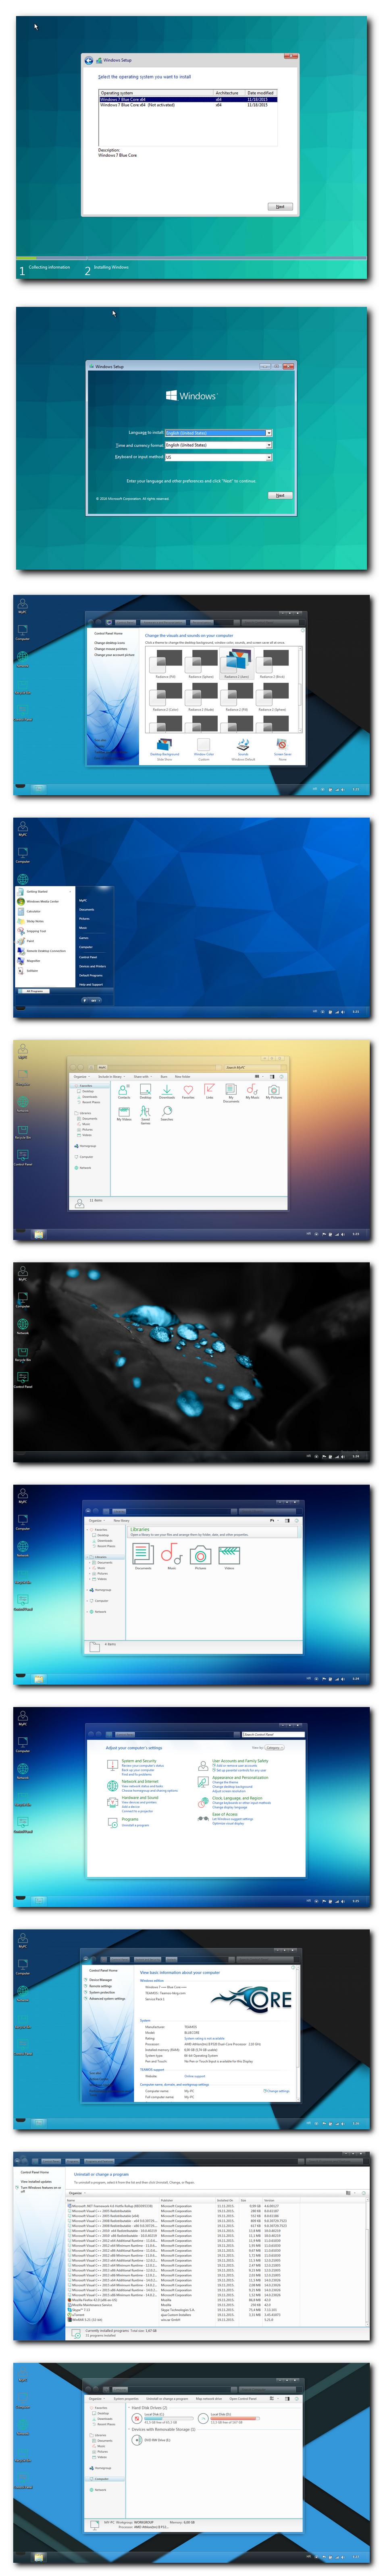 Windows 7 Blue Core (64bit) Axeswy & Tomecar